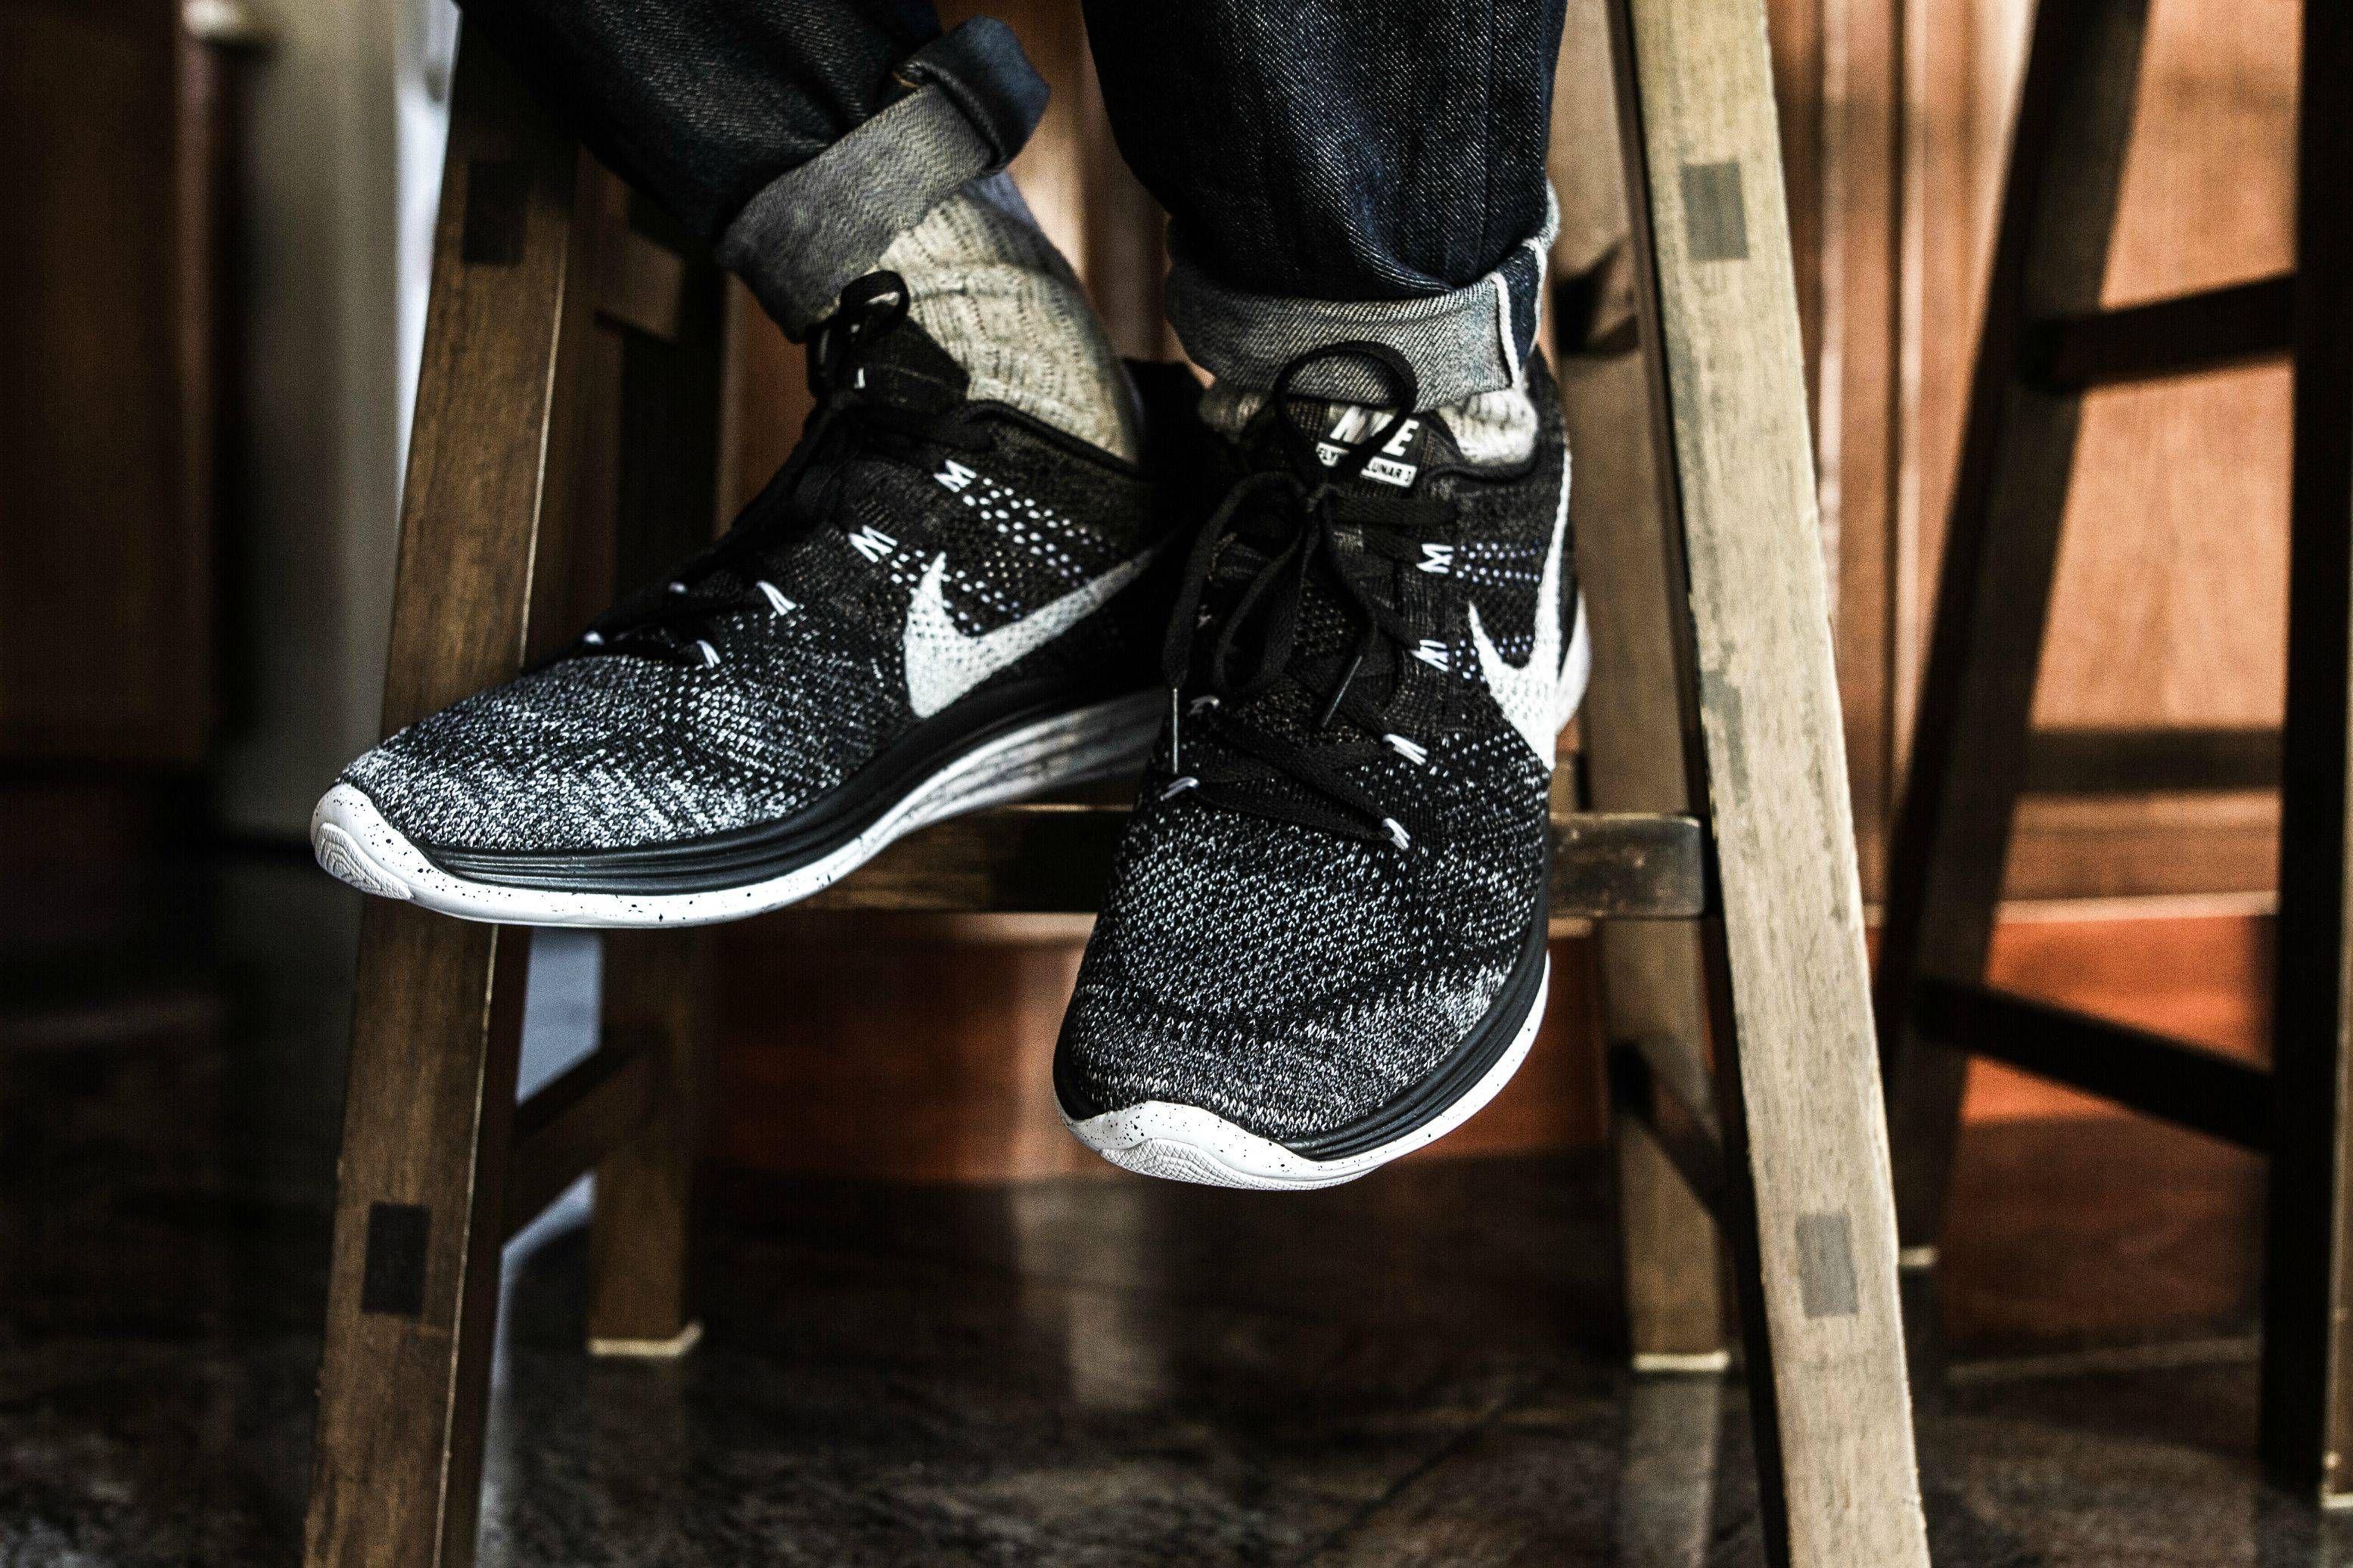 Nike Lunar Flyknit 3 Black And White Running Shoes On Feet White Running Shoes Nike Lunar Shoes